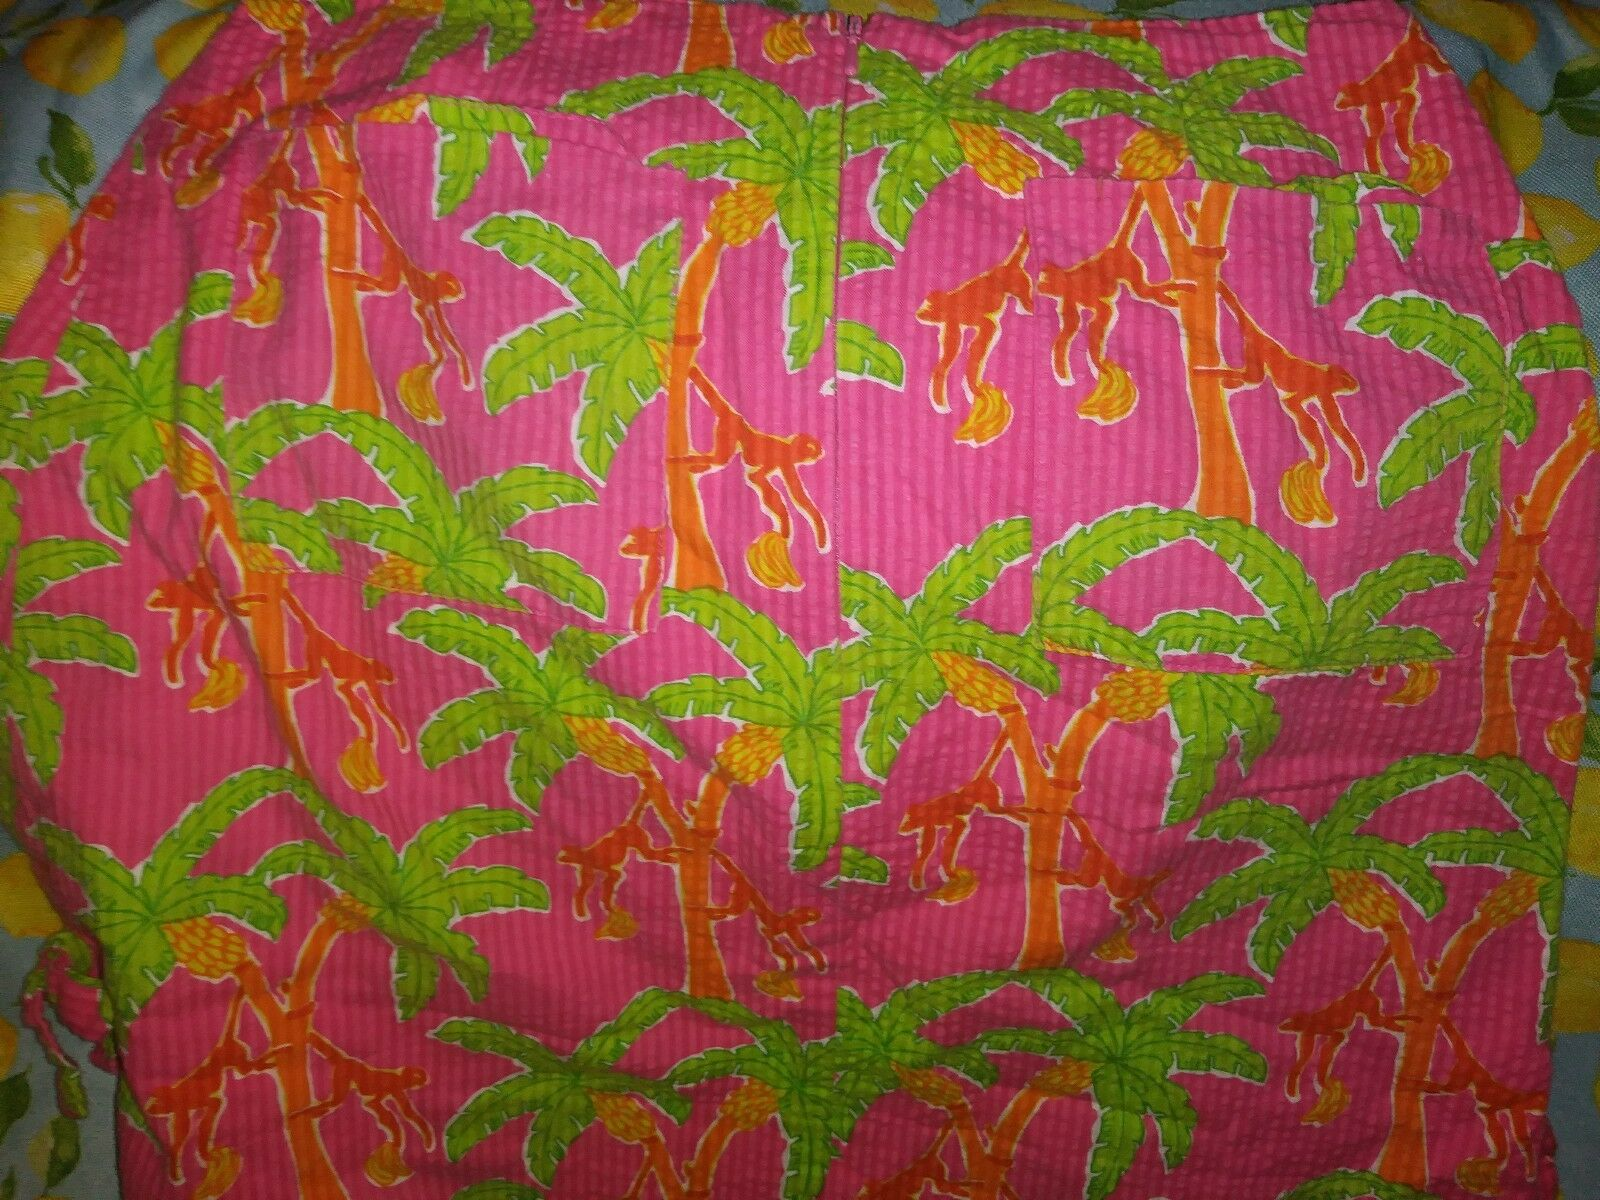 Lilly Pulitzer Monkey Palm Trees Skirt Beautiful Sz 8